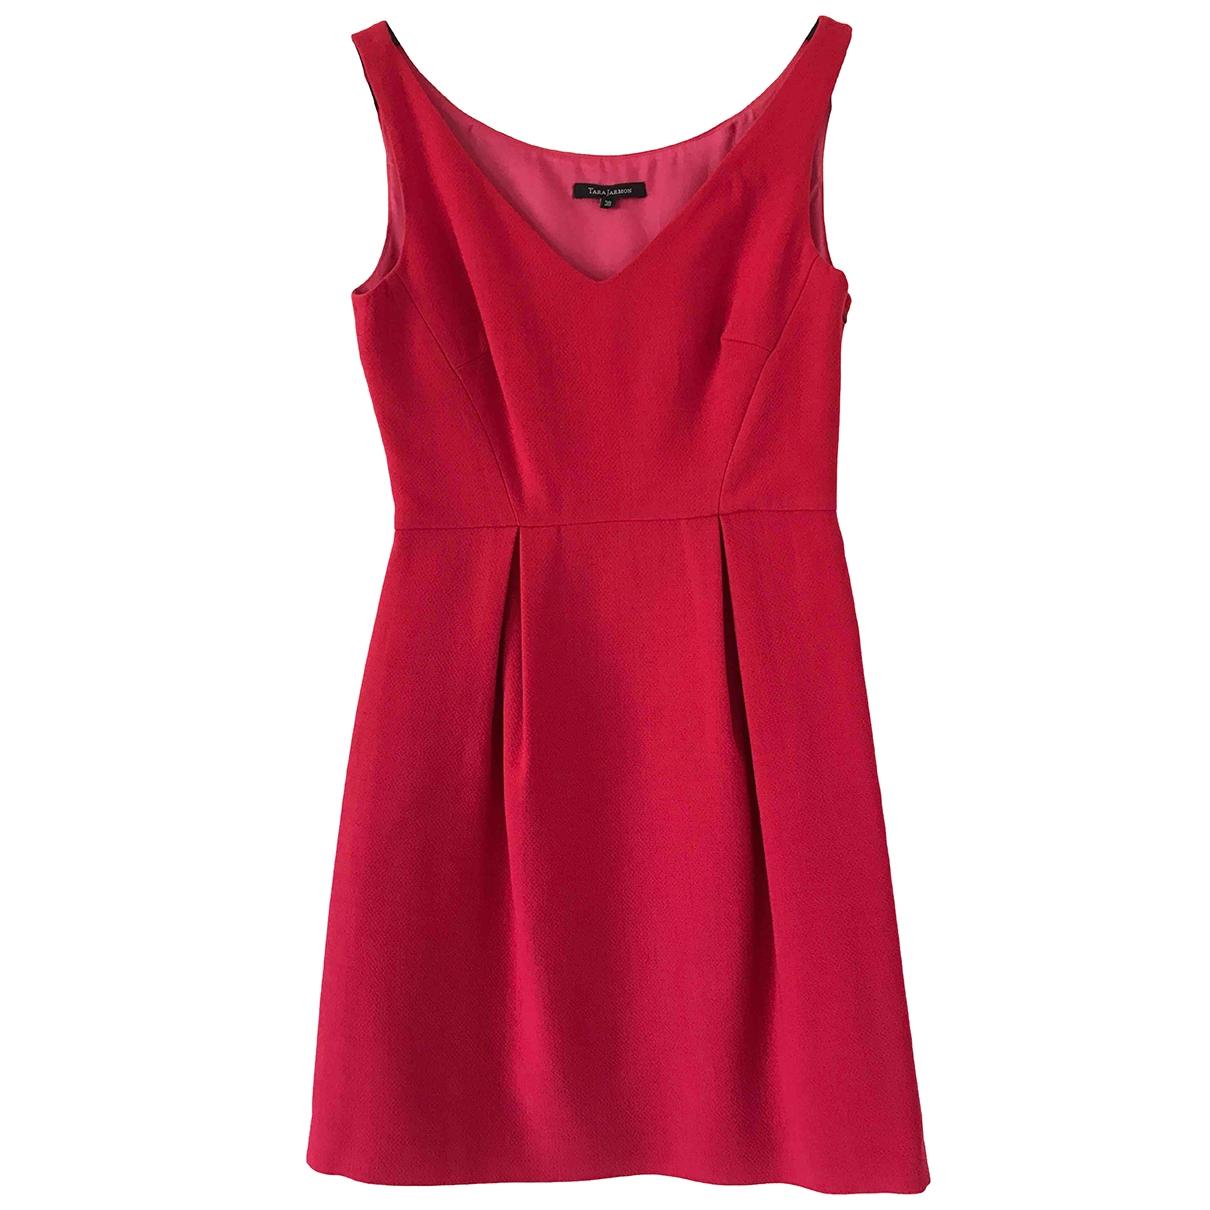 Tara Jarmon - Robe   pour femme en laine - rose